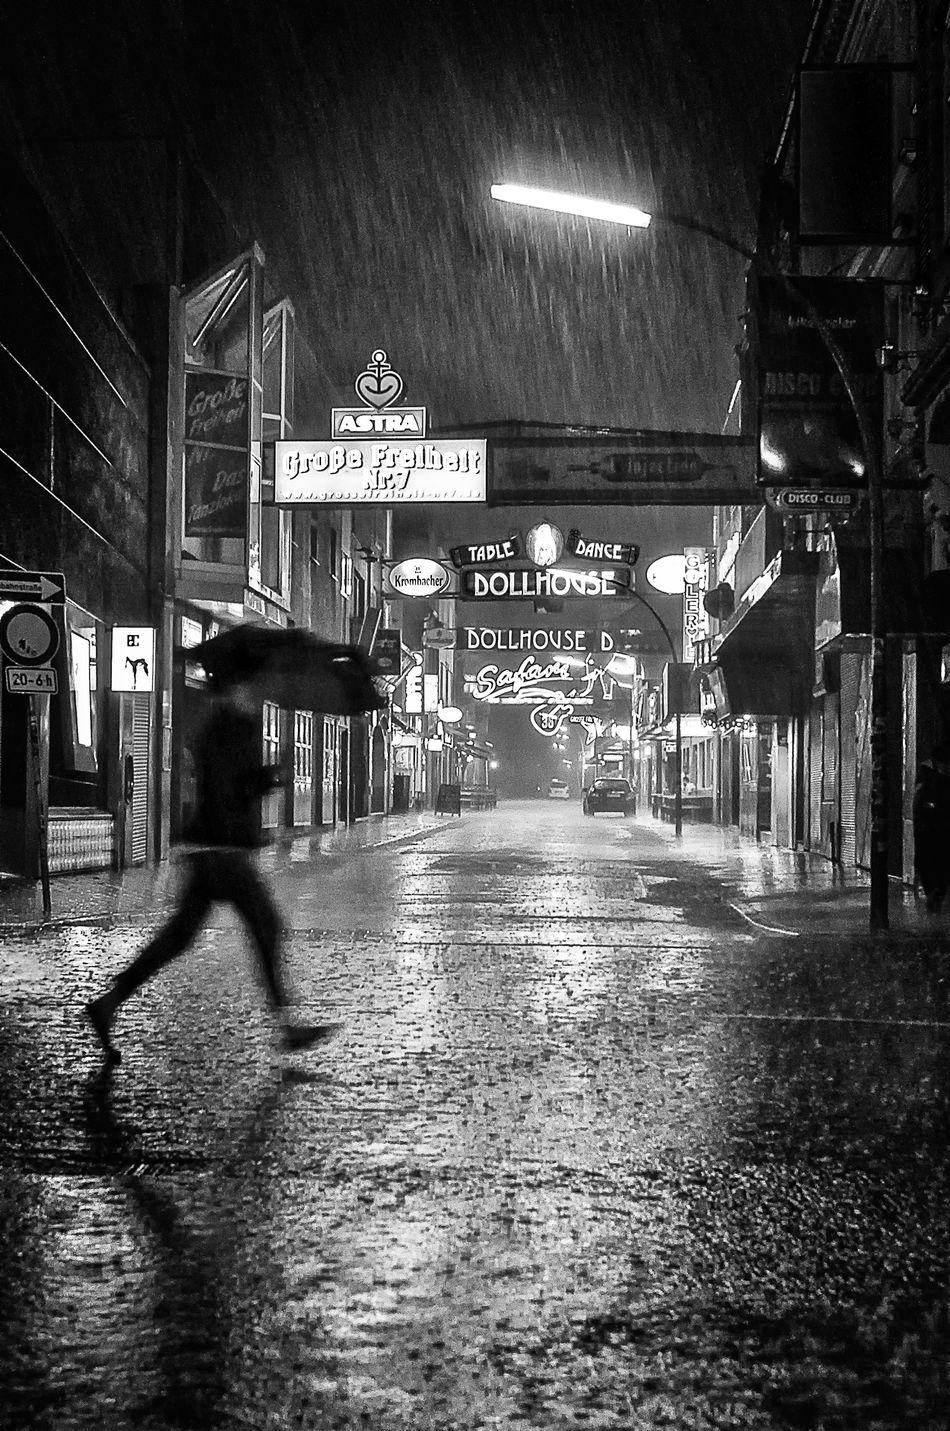 Black & White City City Life Marcokleinphotography Men Narrow Pouring Rain Rain Street Walking Here Belongs To Me Photography In Motion The Street Photographer - 2016 EyeEm Awards